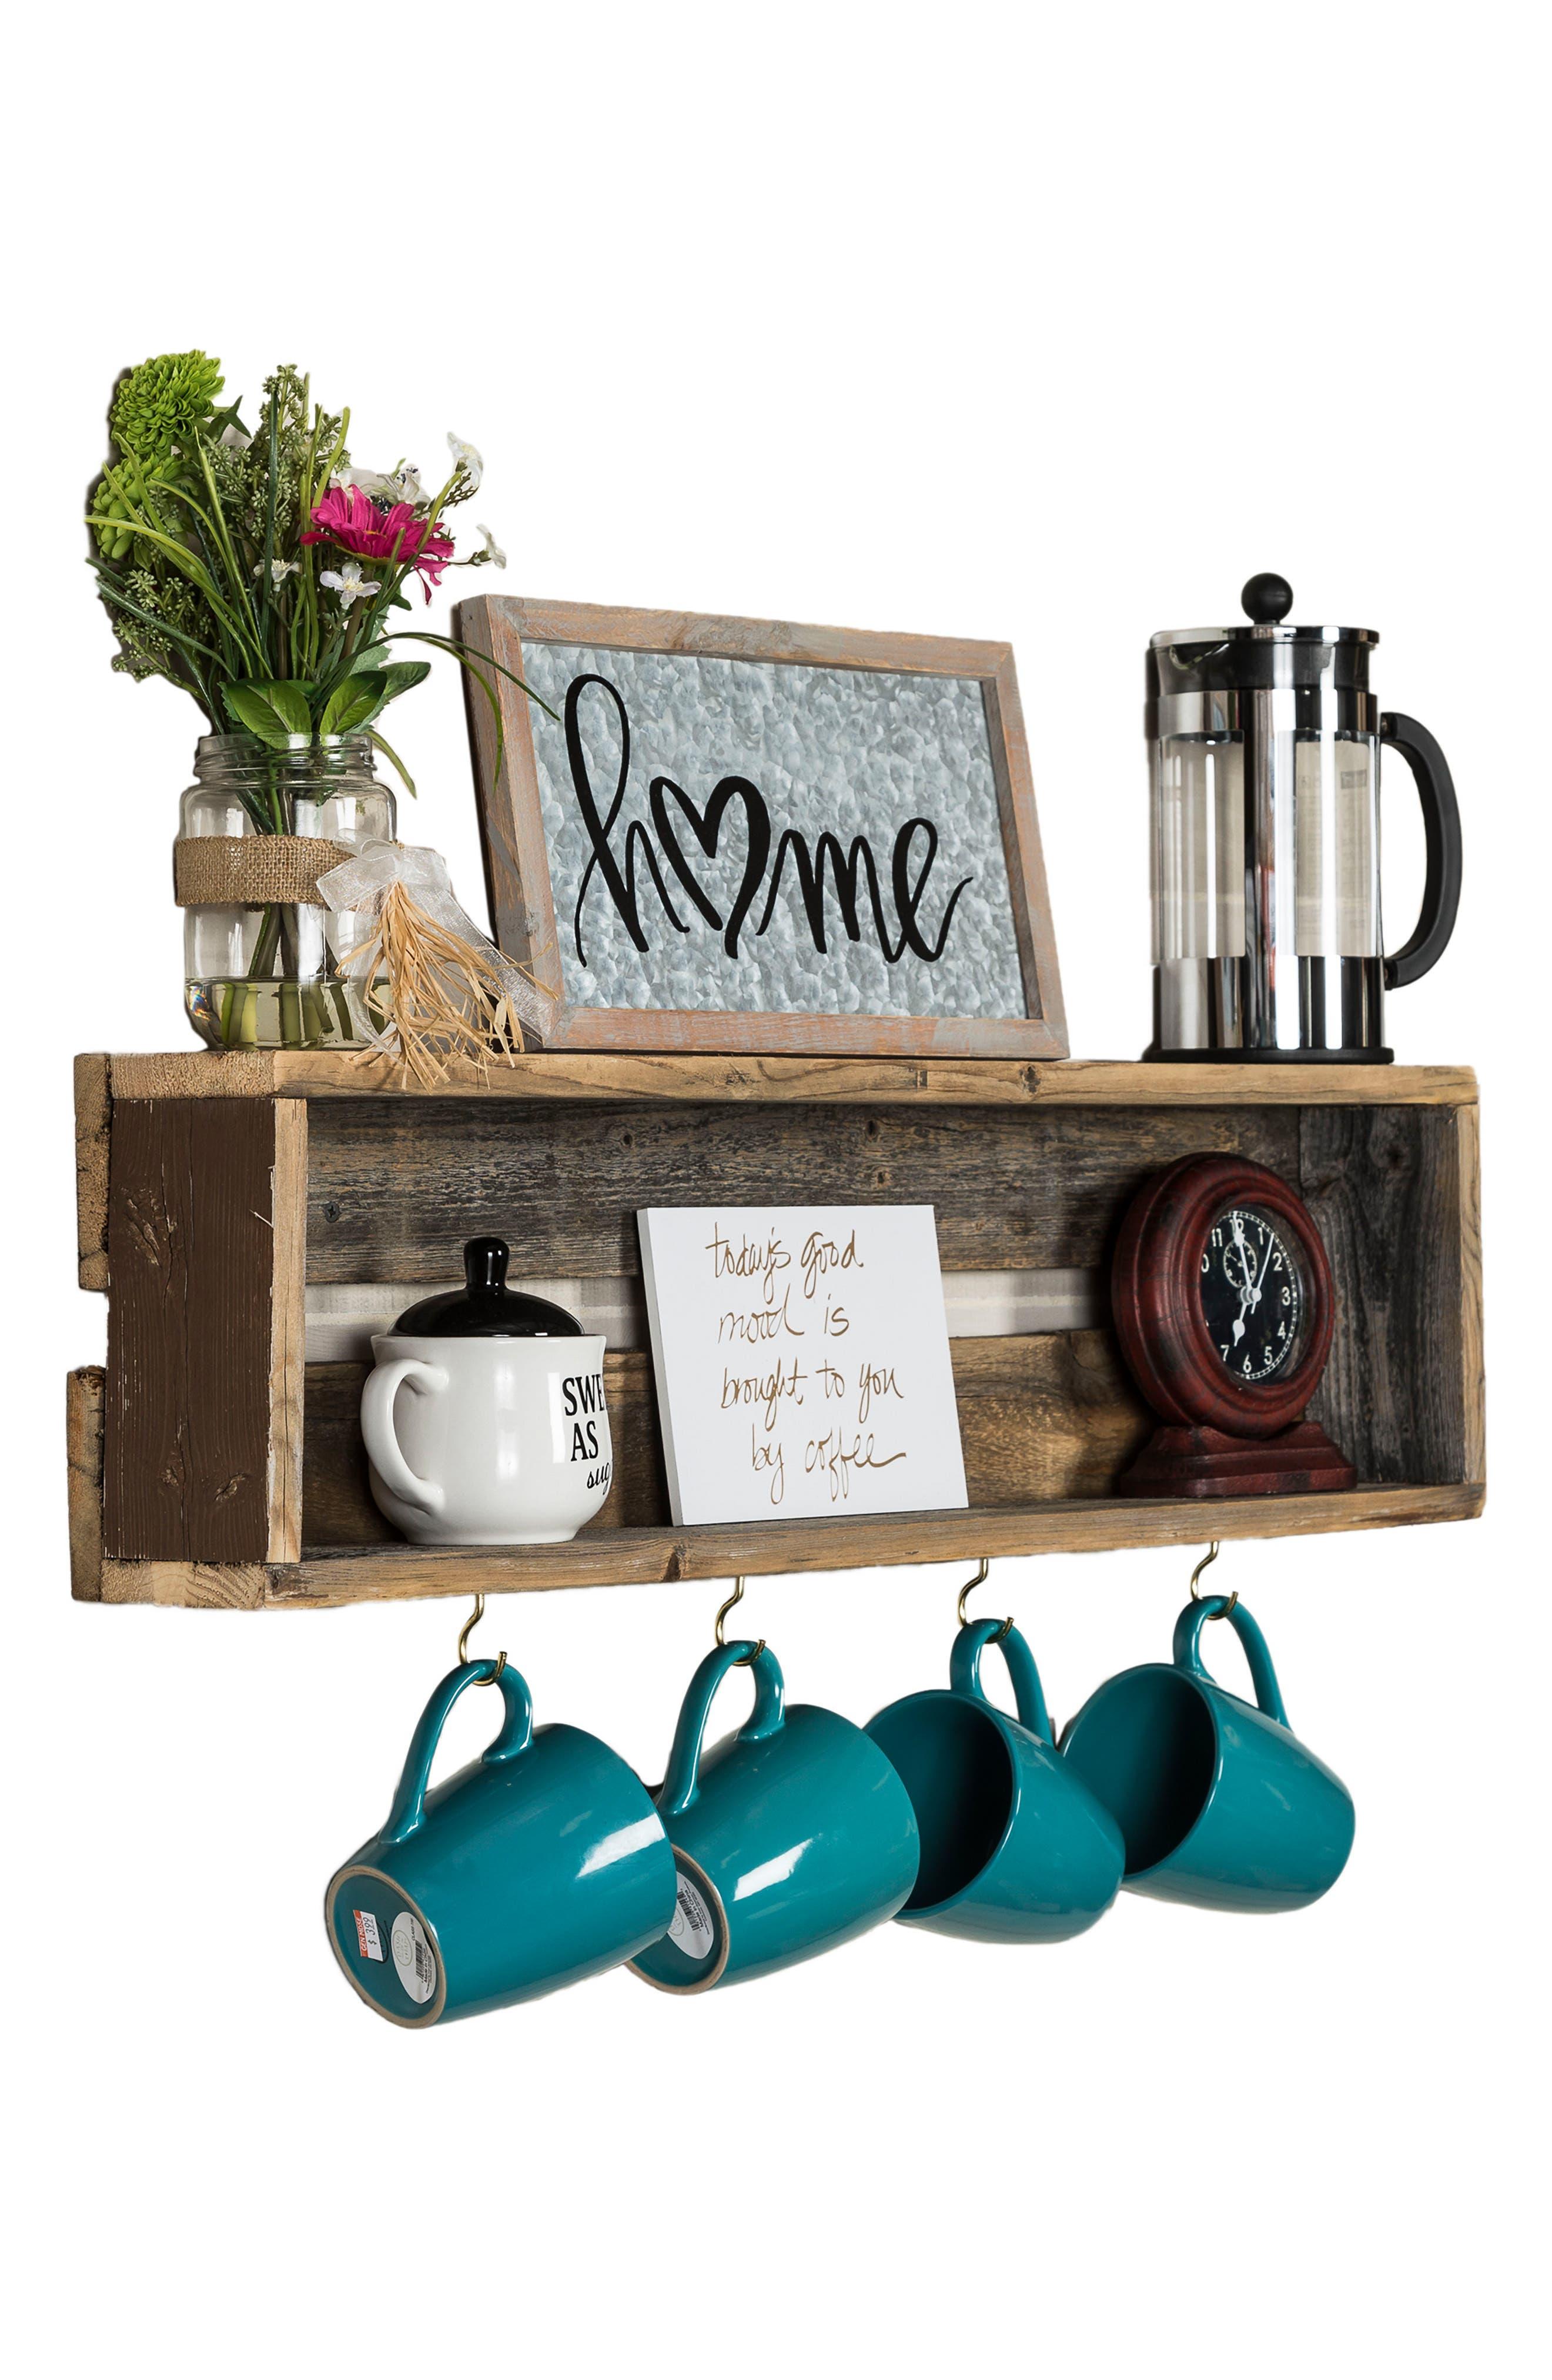 Repurposed Wood Shelf with Hooks,                             Alternate thumbnail 8, color,                             200